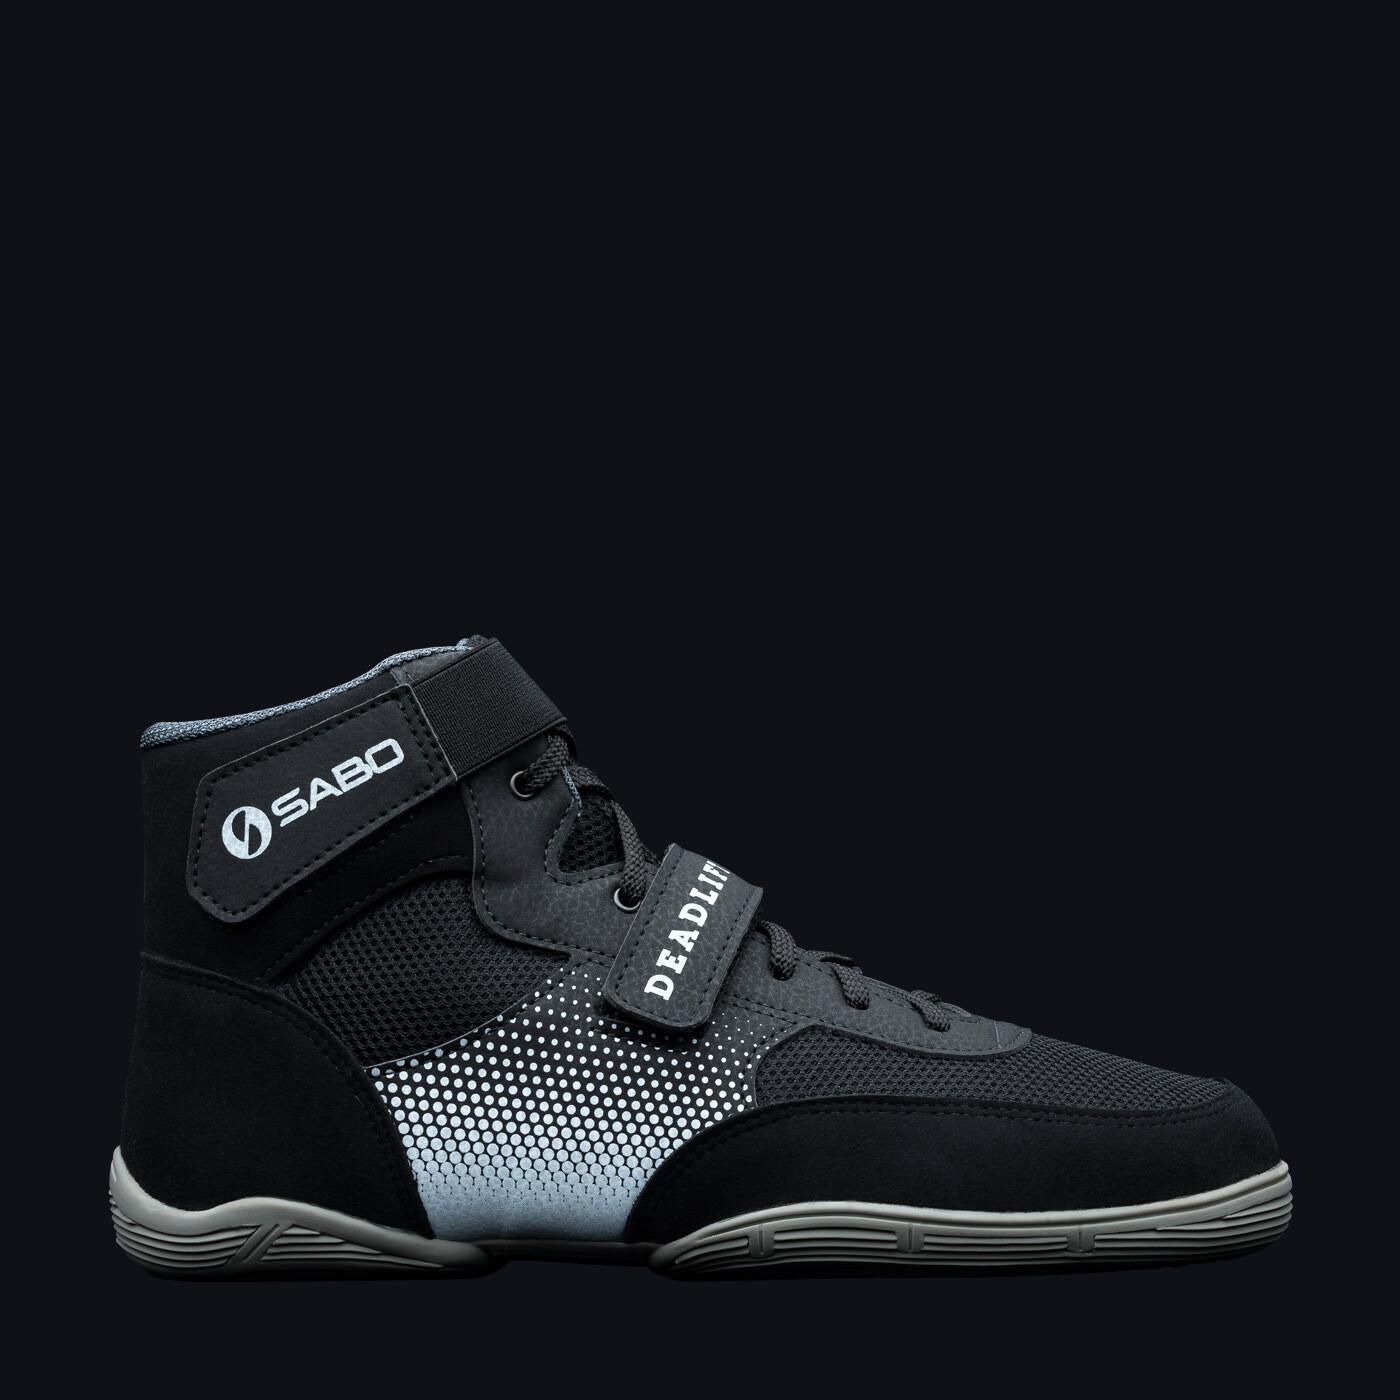 SABO DEADLIFT 1 BLACK powerlifting deadlift gym shoes